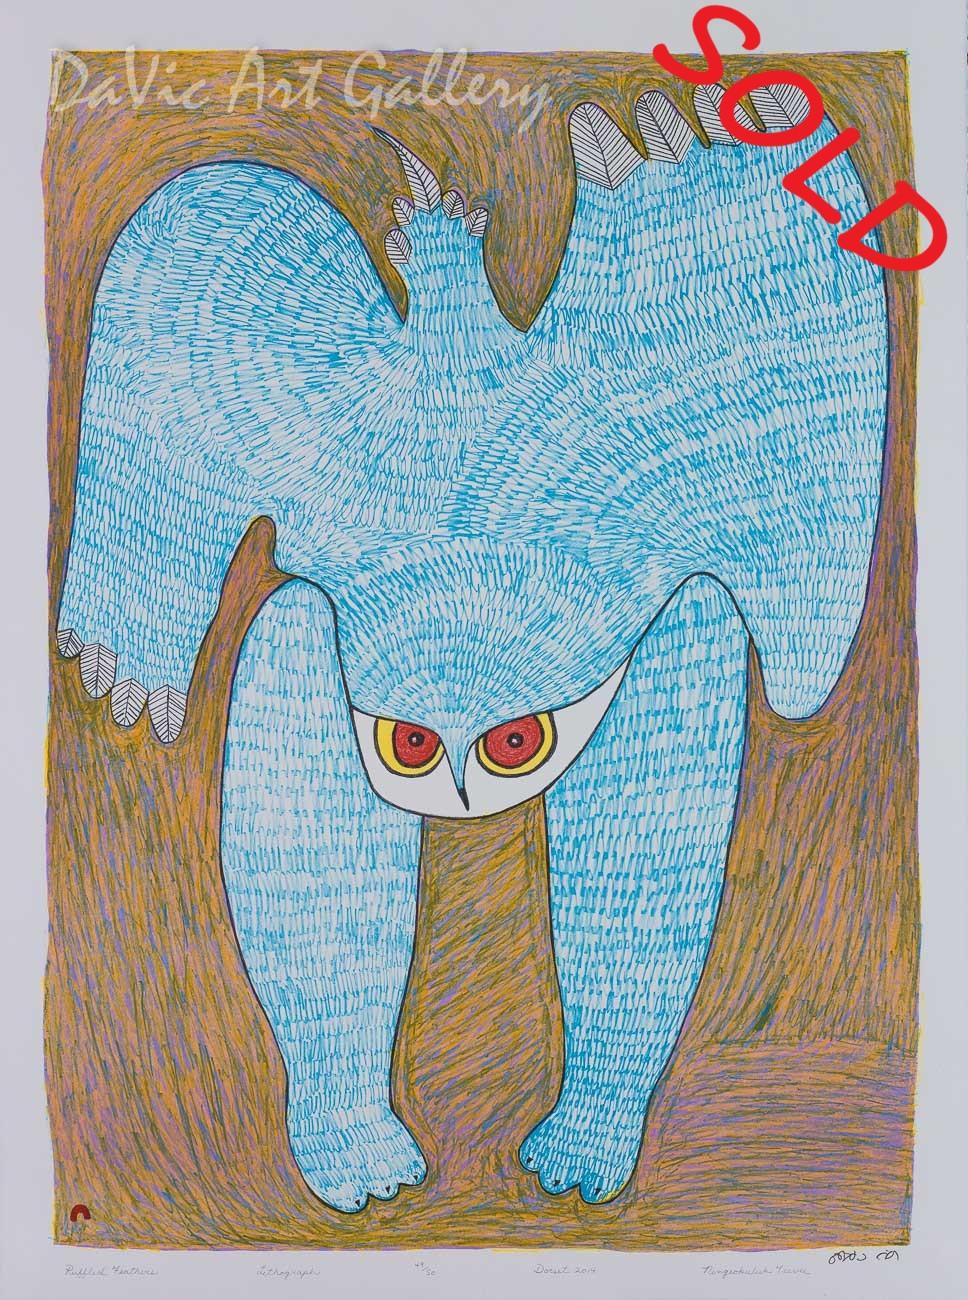 'Ruffled Feathers' by Ningeokuluk Teevee